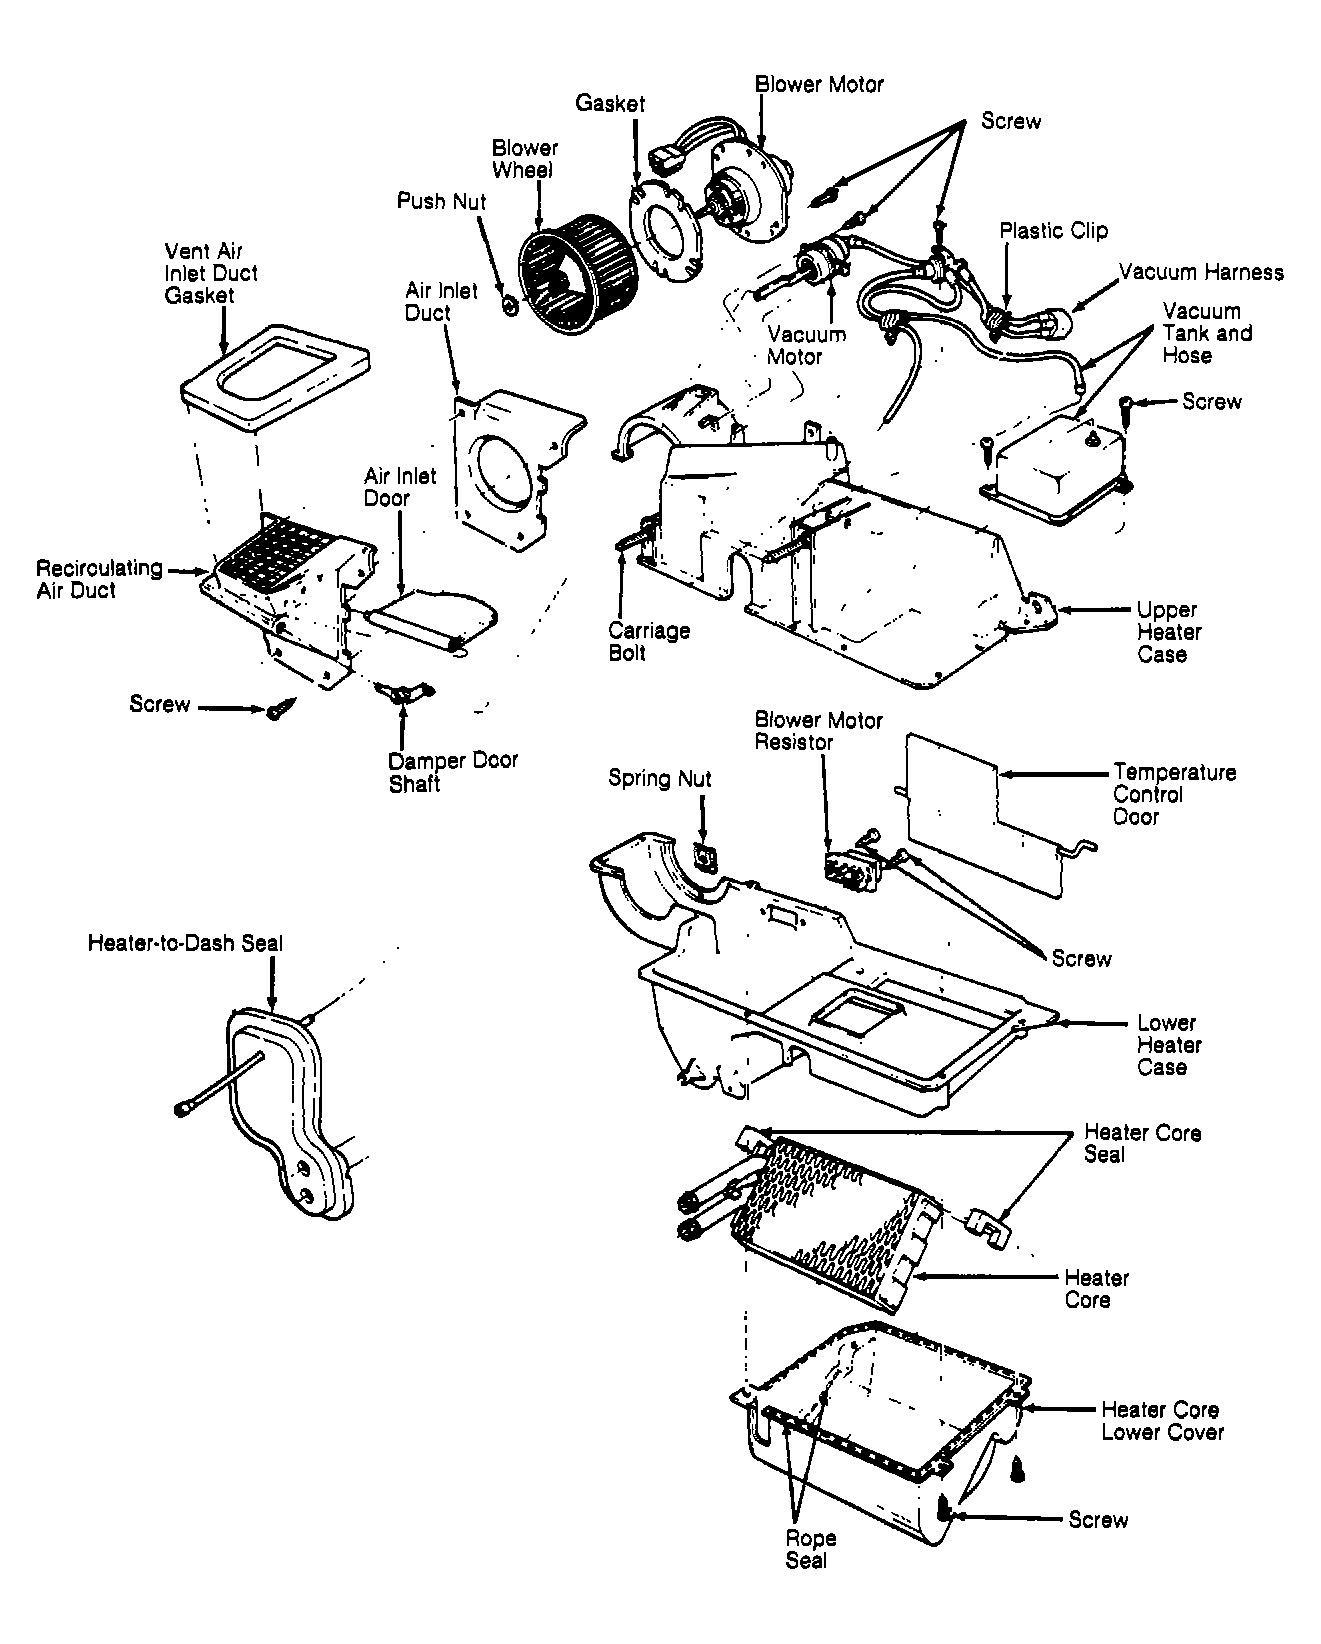 1957 ford fairlane tail light wiring diagram 1957 mercury montclair wiring diagram wiring